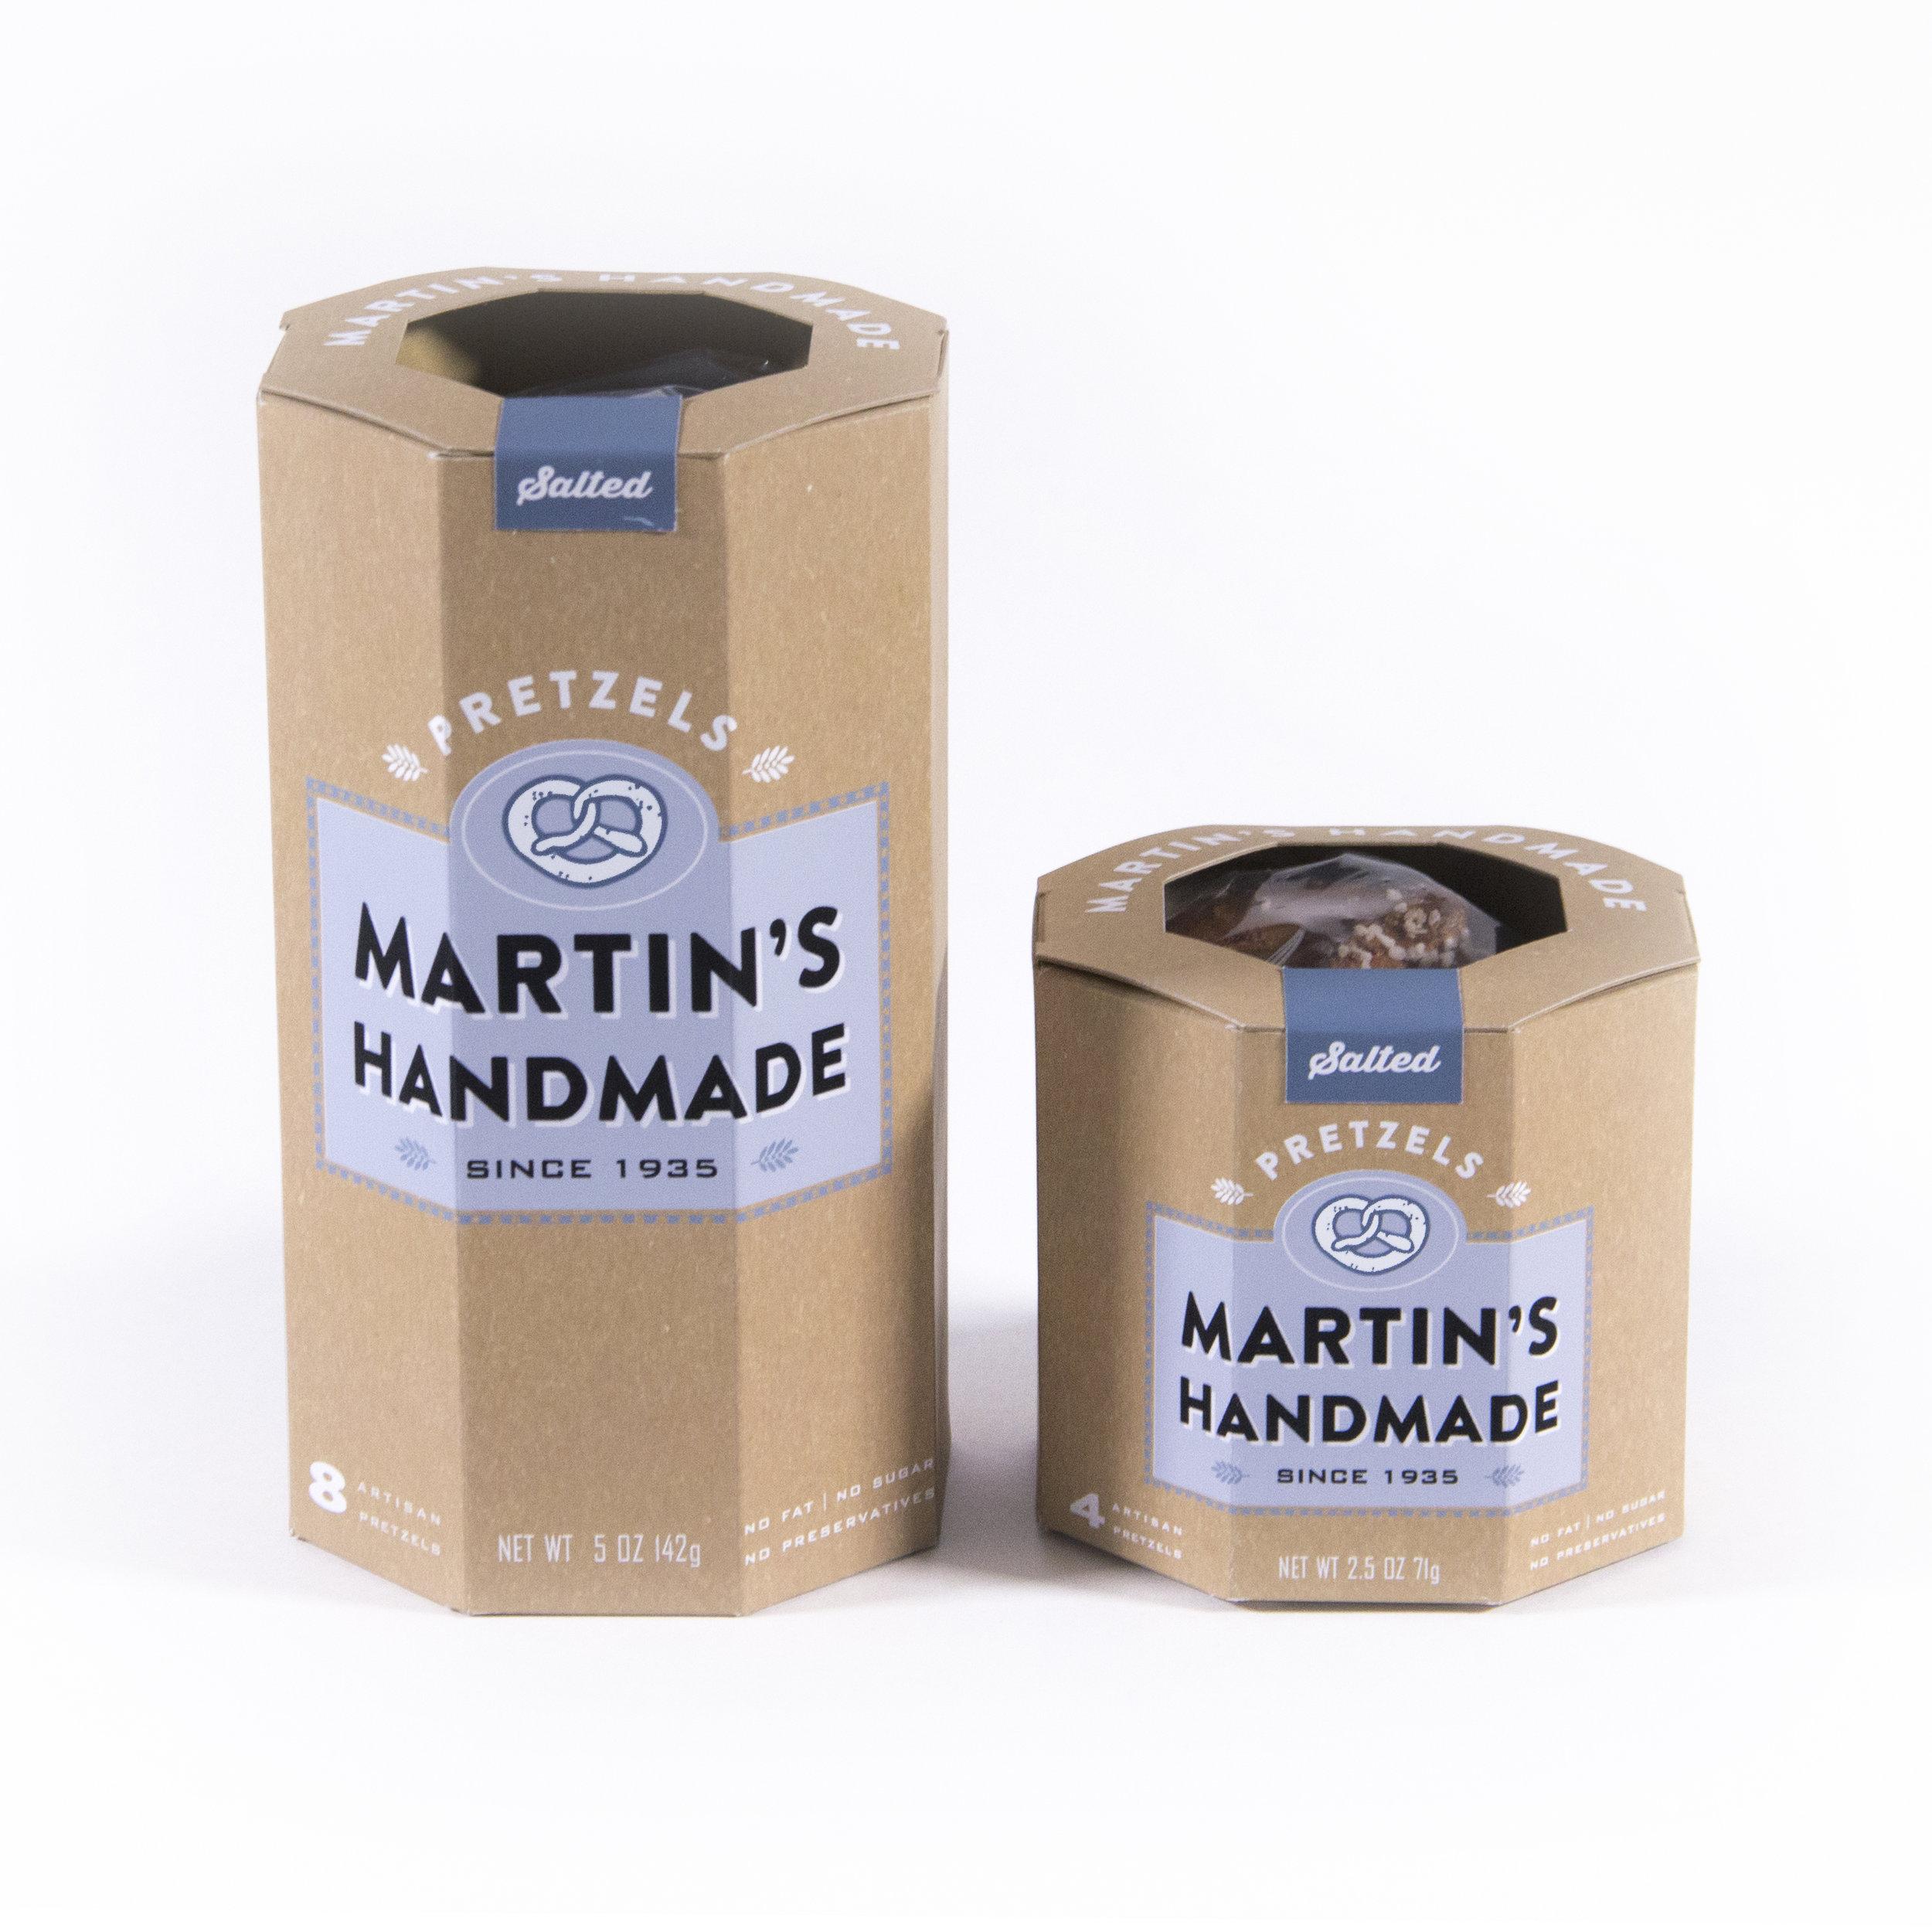 martins pair square.jpg